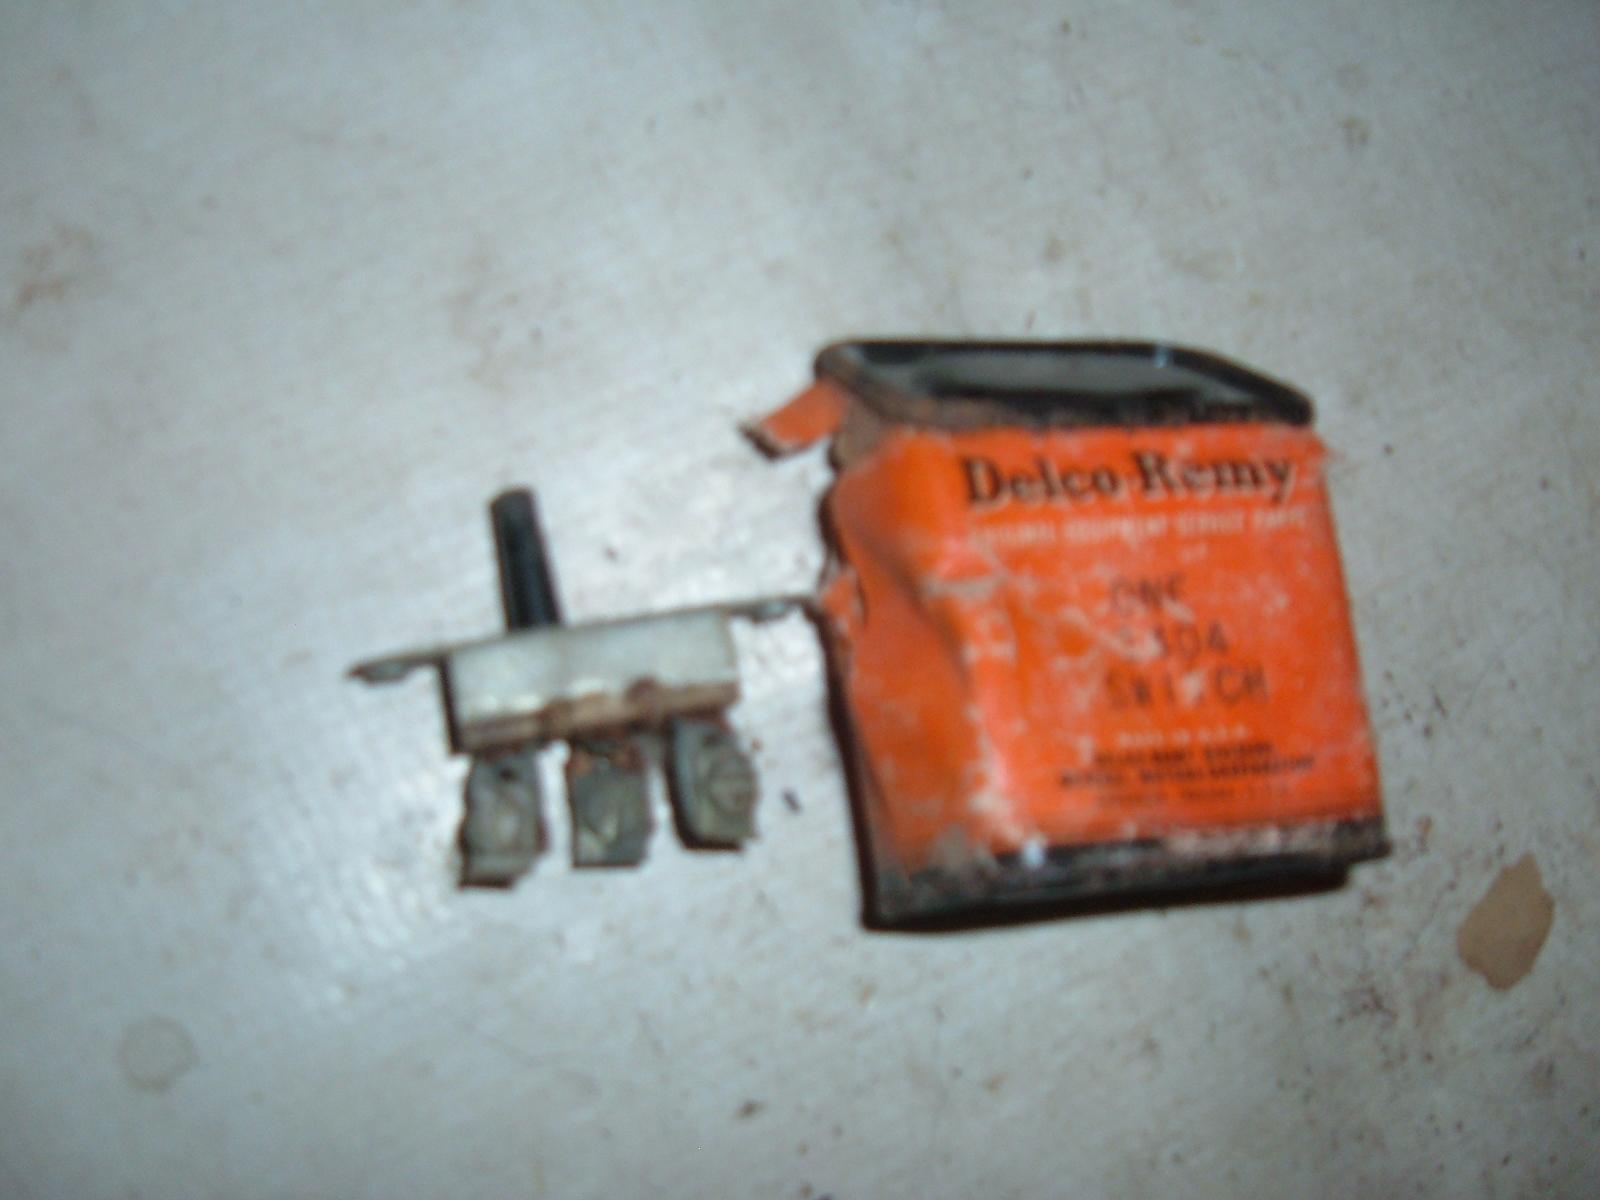 1936 37 38 39 40 41 buick oldsmobile chevrolet dash light switch nos gm 1404 (z 1404)